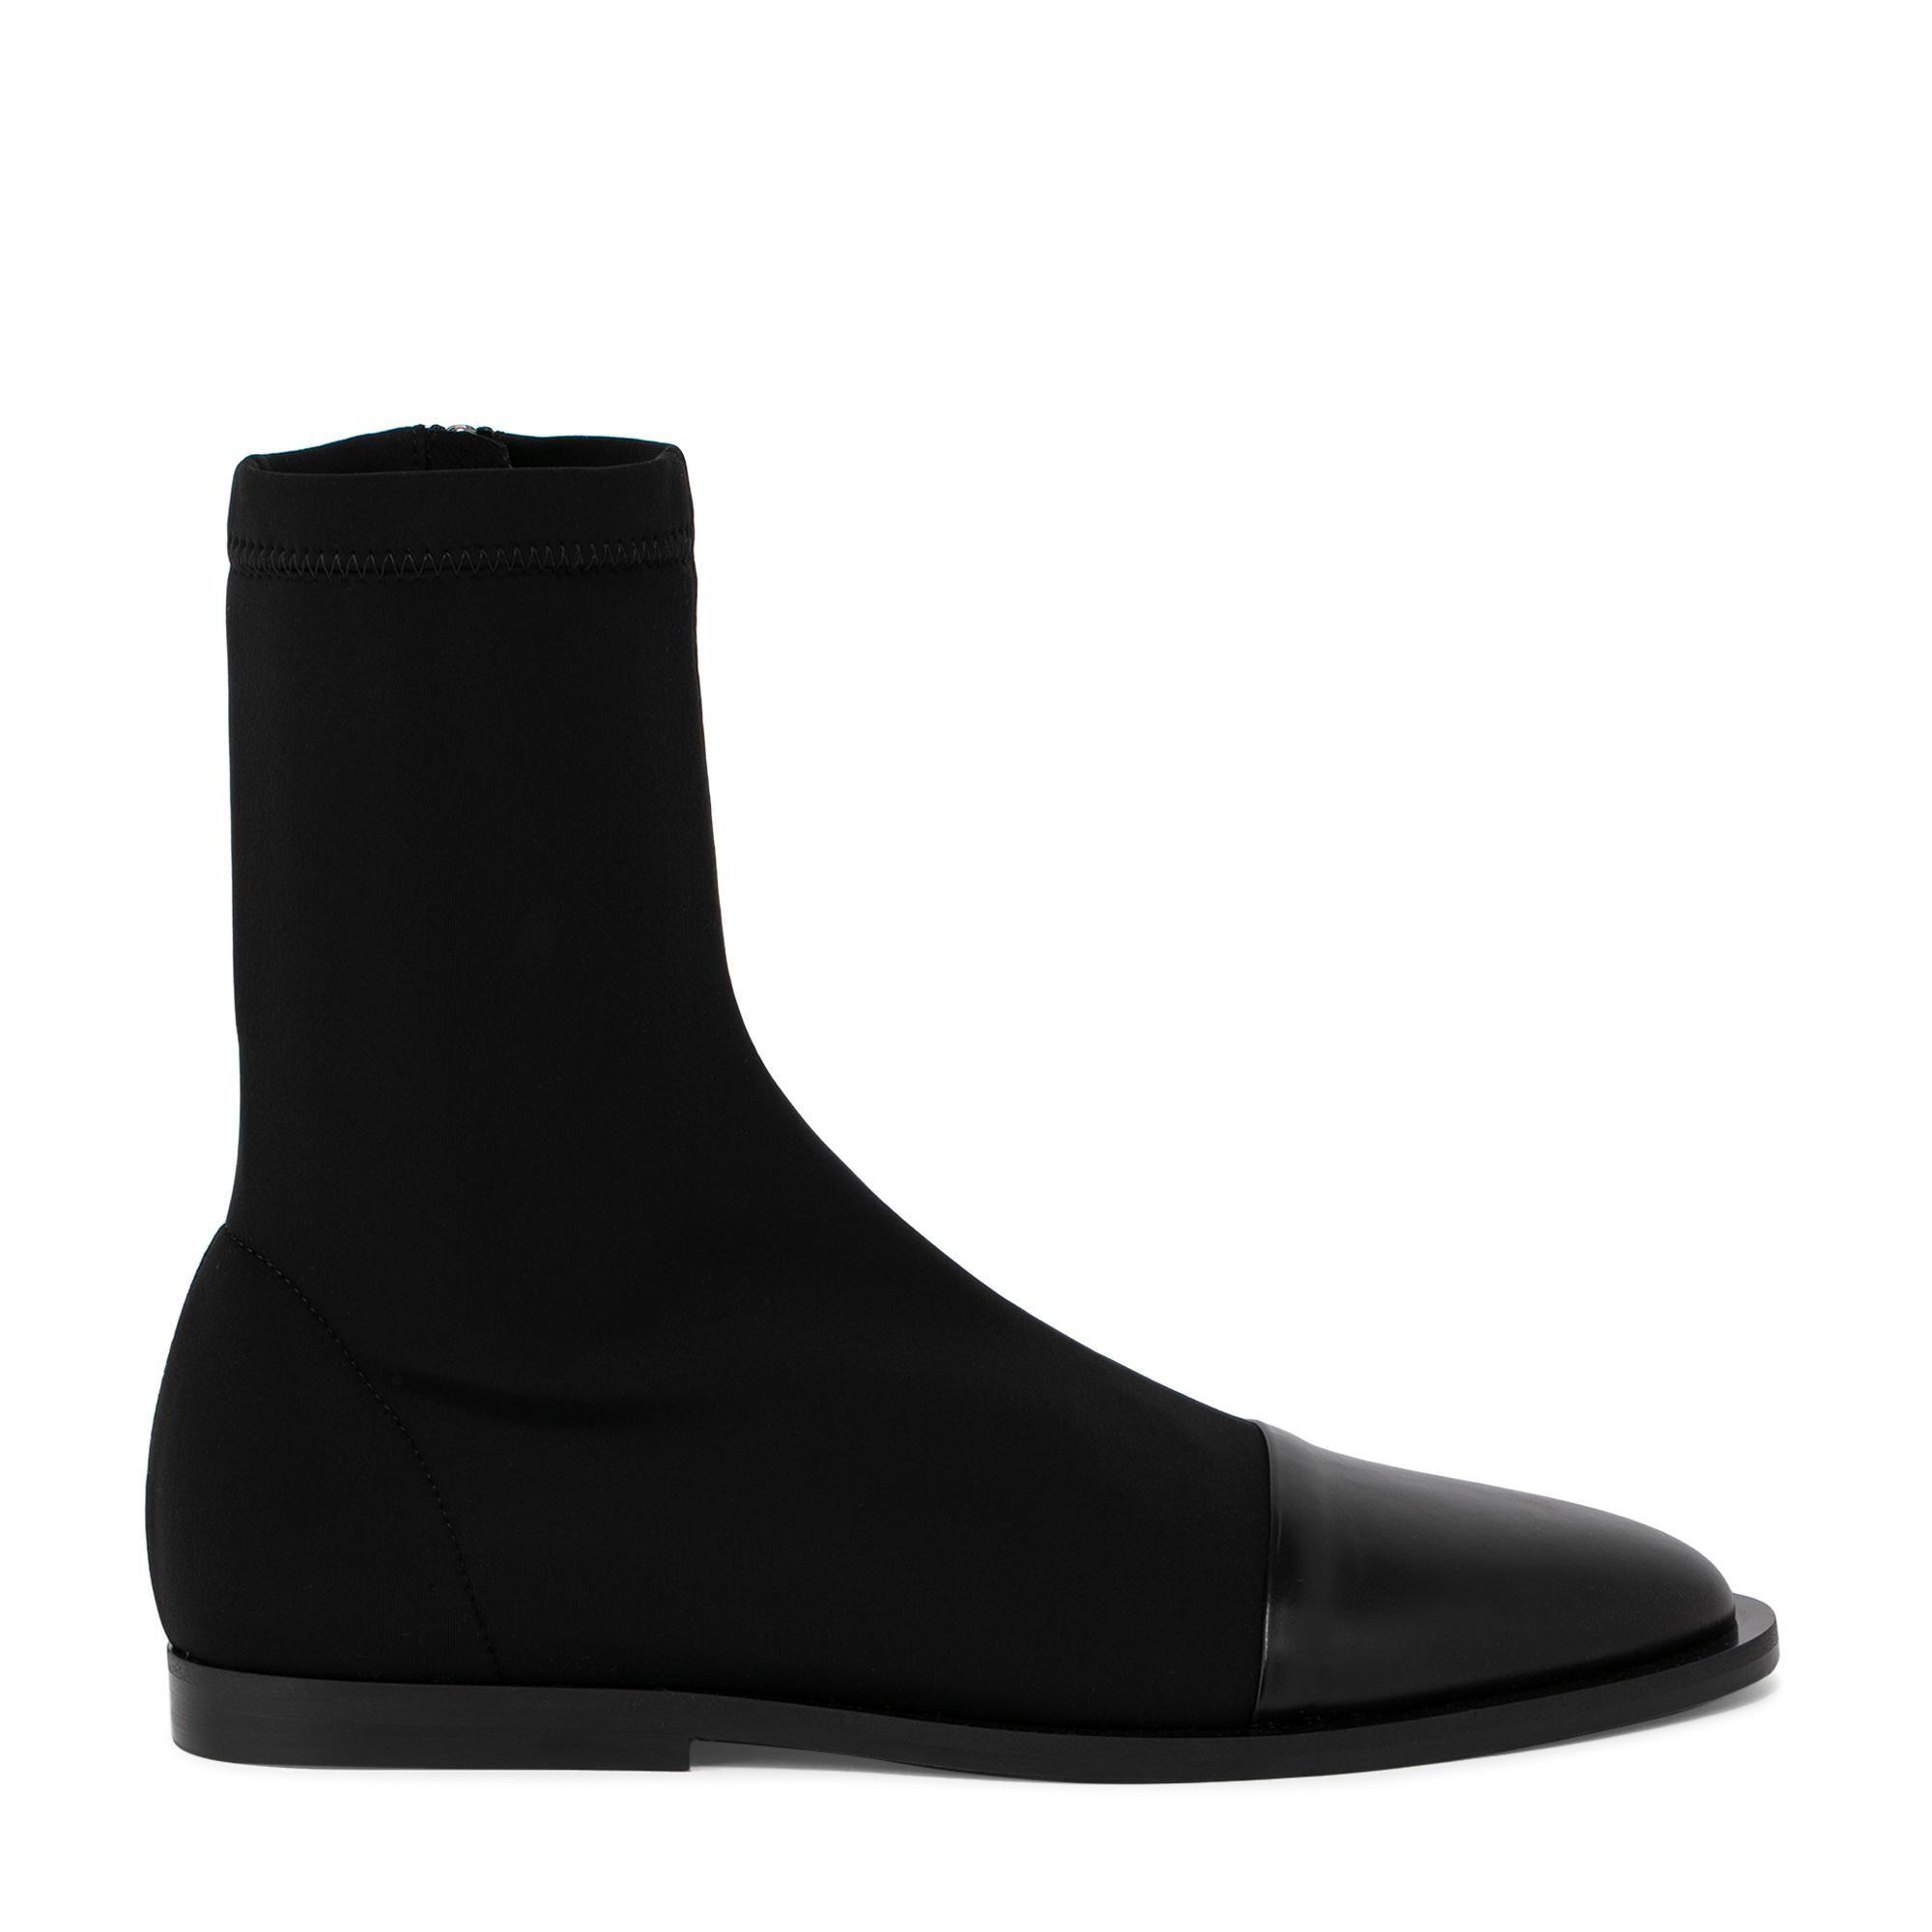 Loreto boots